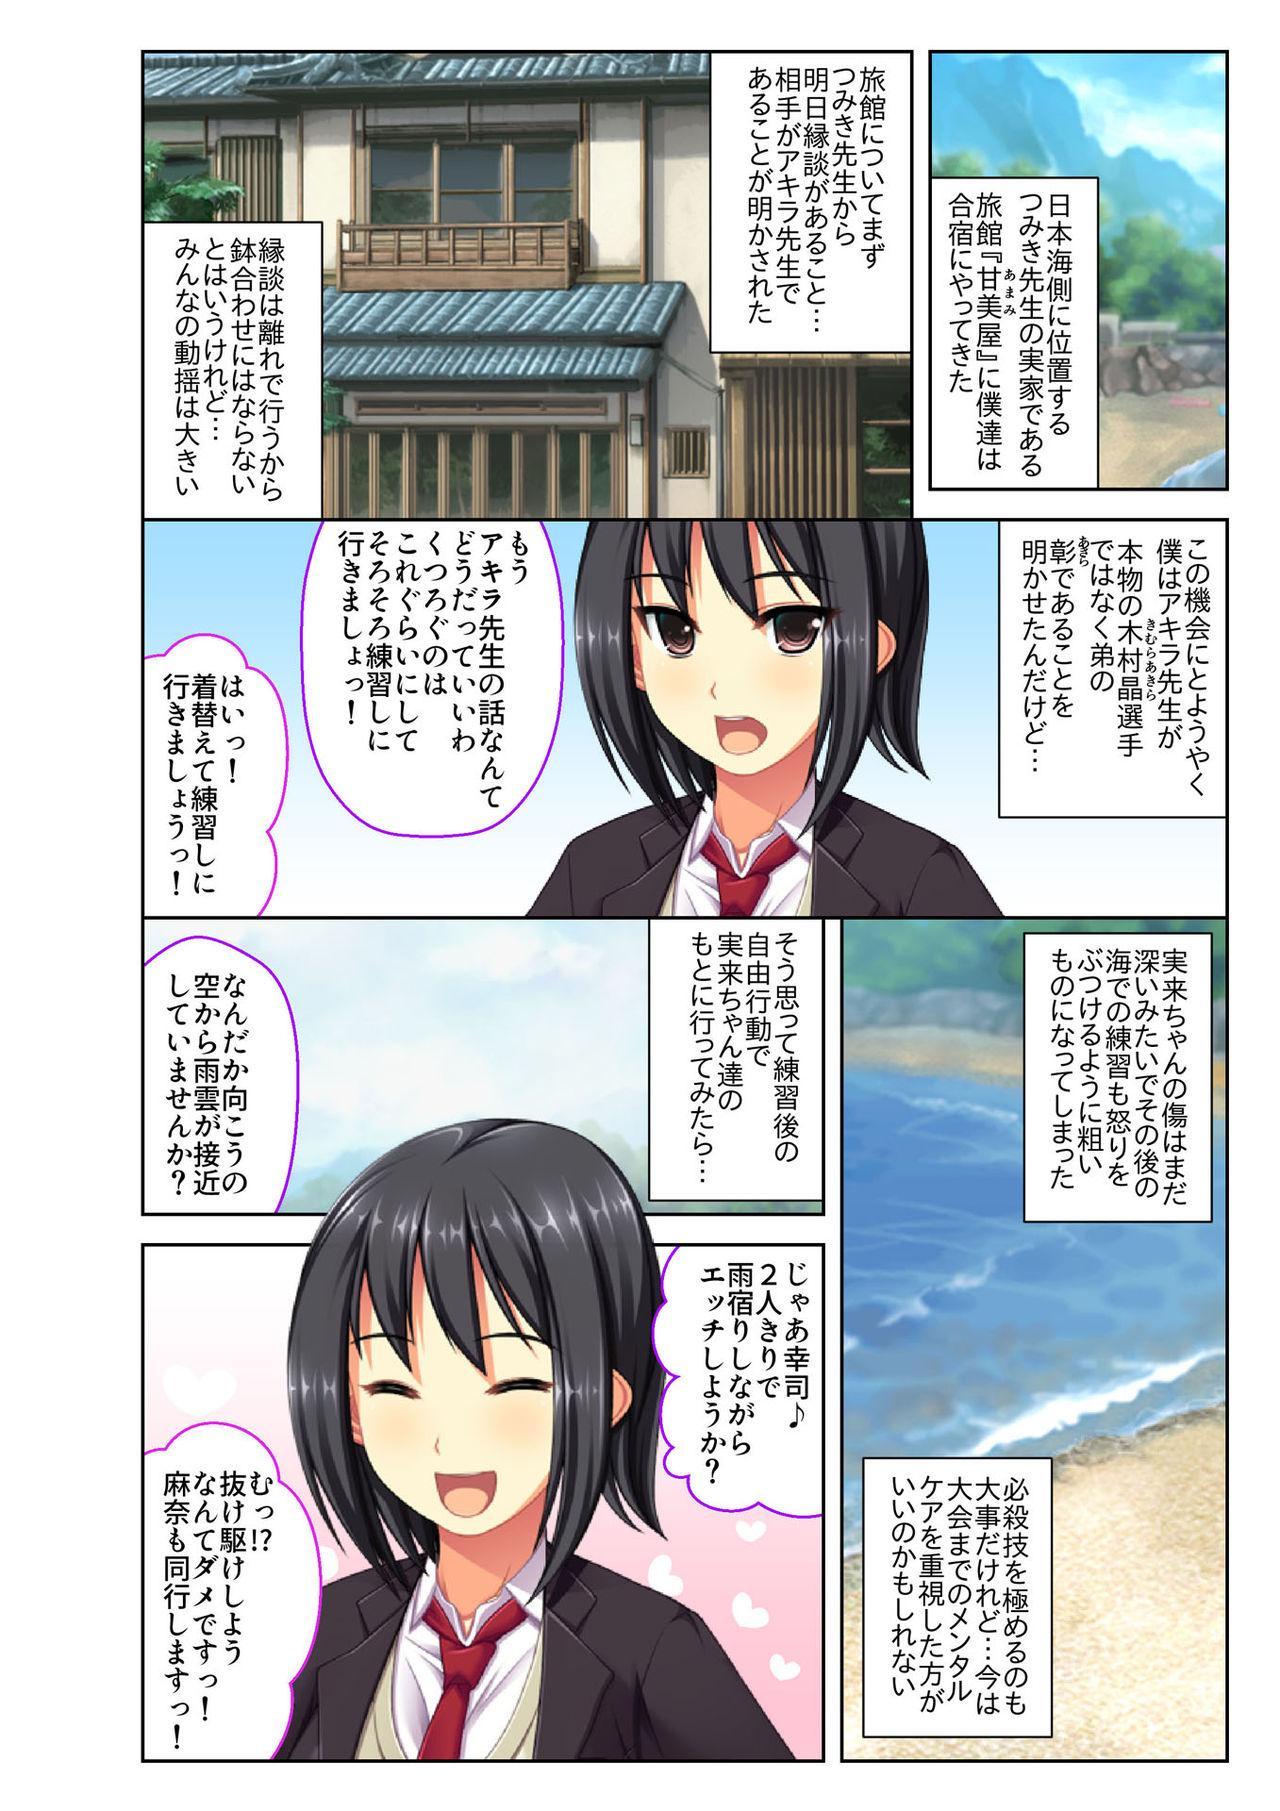 [Drops!] Gohoubi Ecchi! ~Mizugi o Zurashite Sukinadake~ 4 22